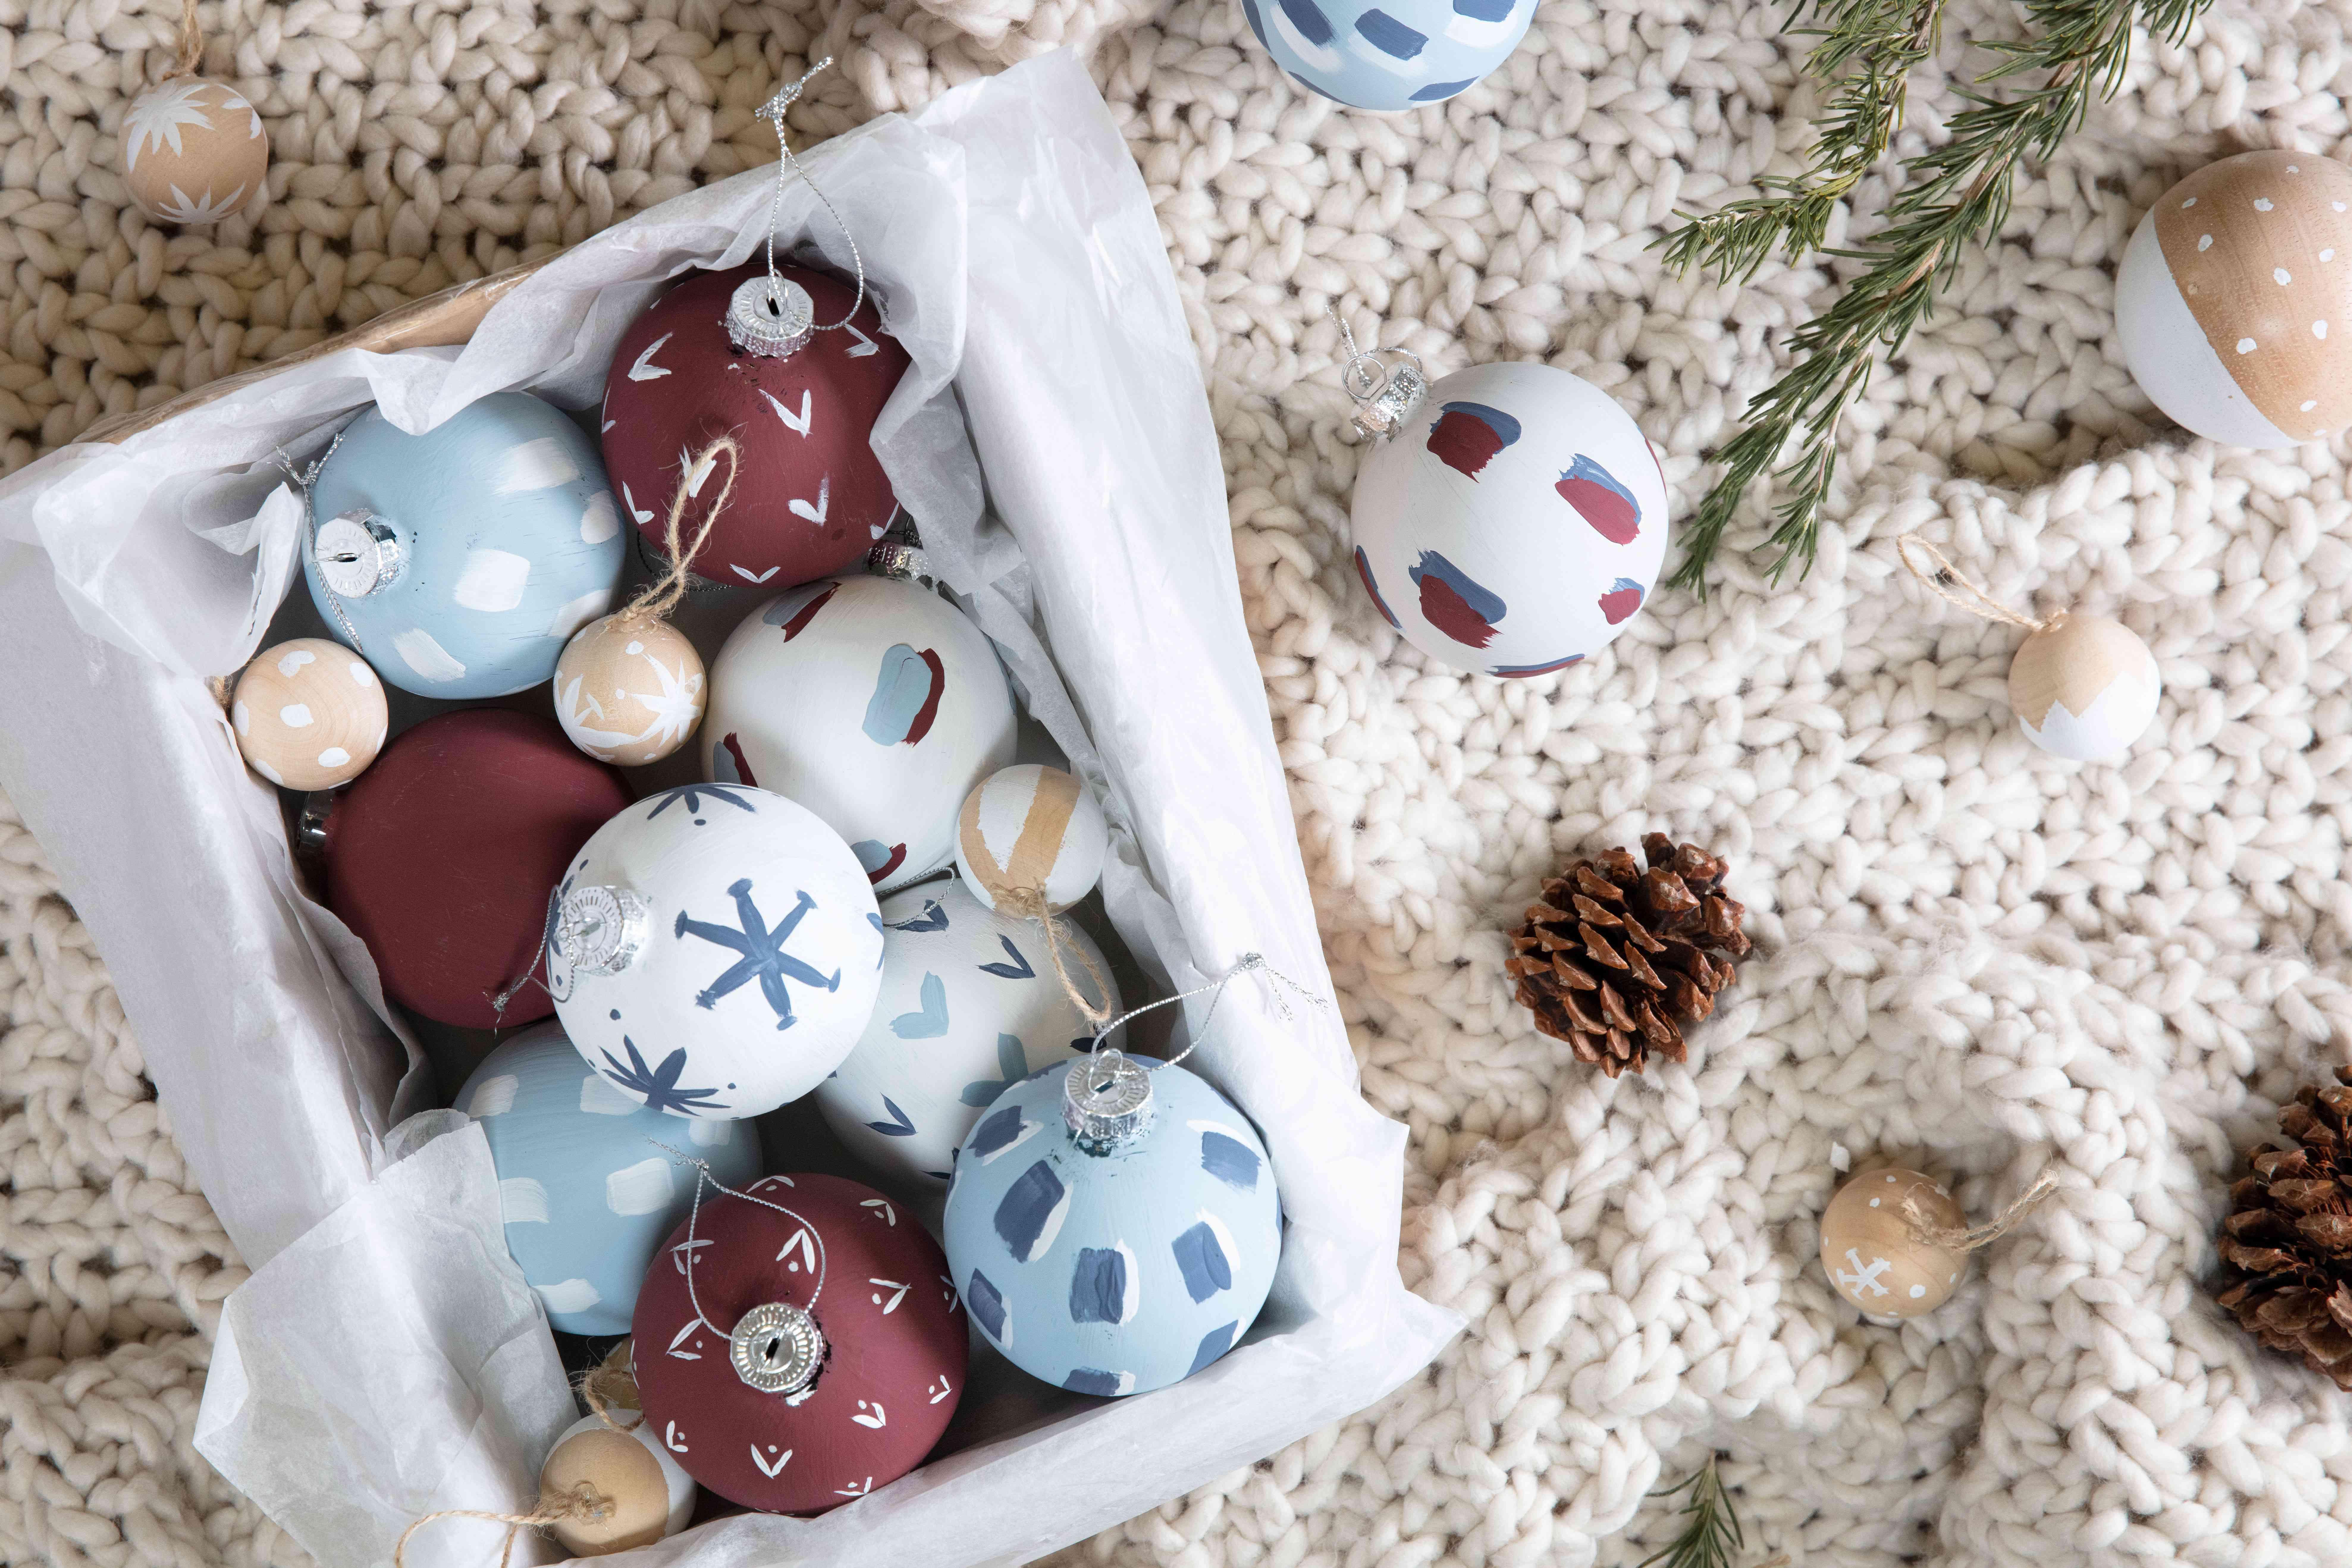 Ornaments in a box